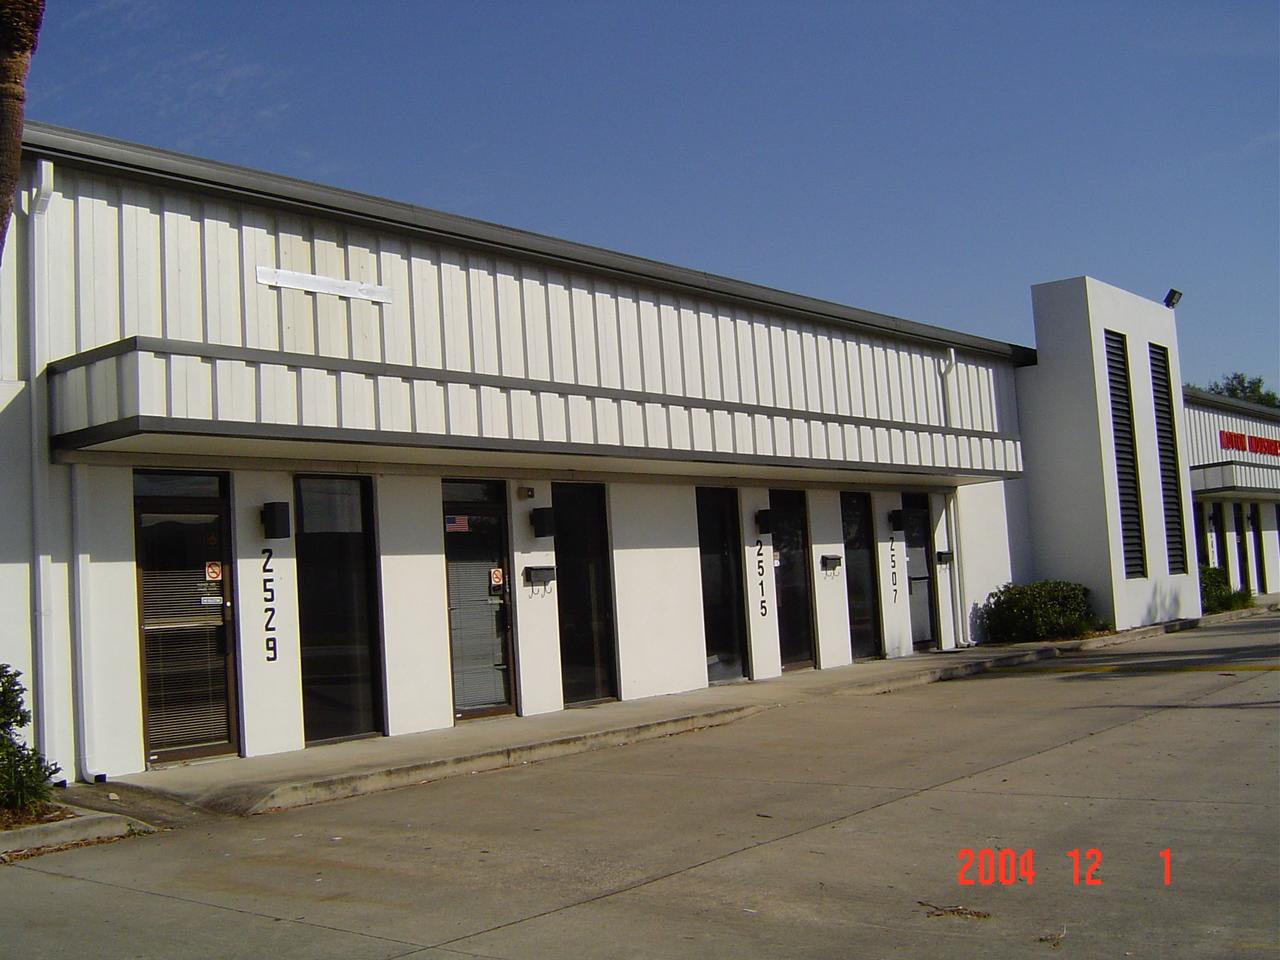 Office/Warehouse/Flex Building